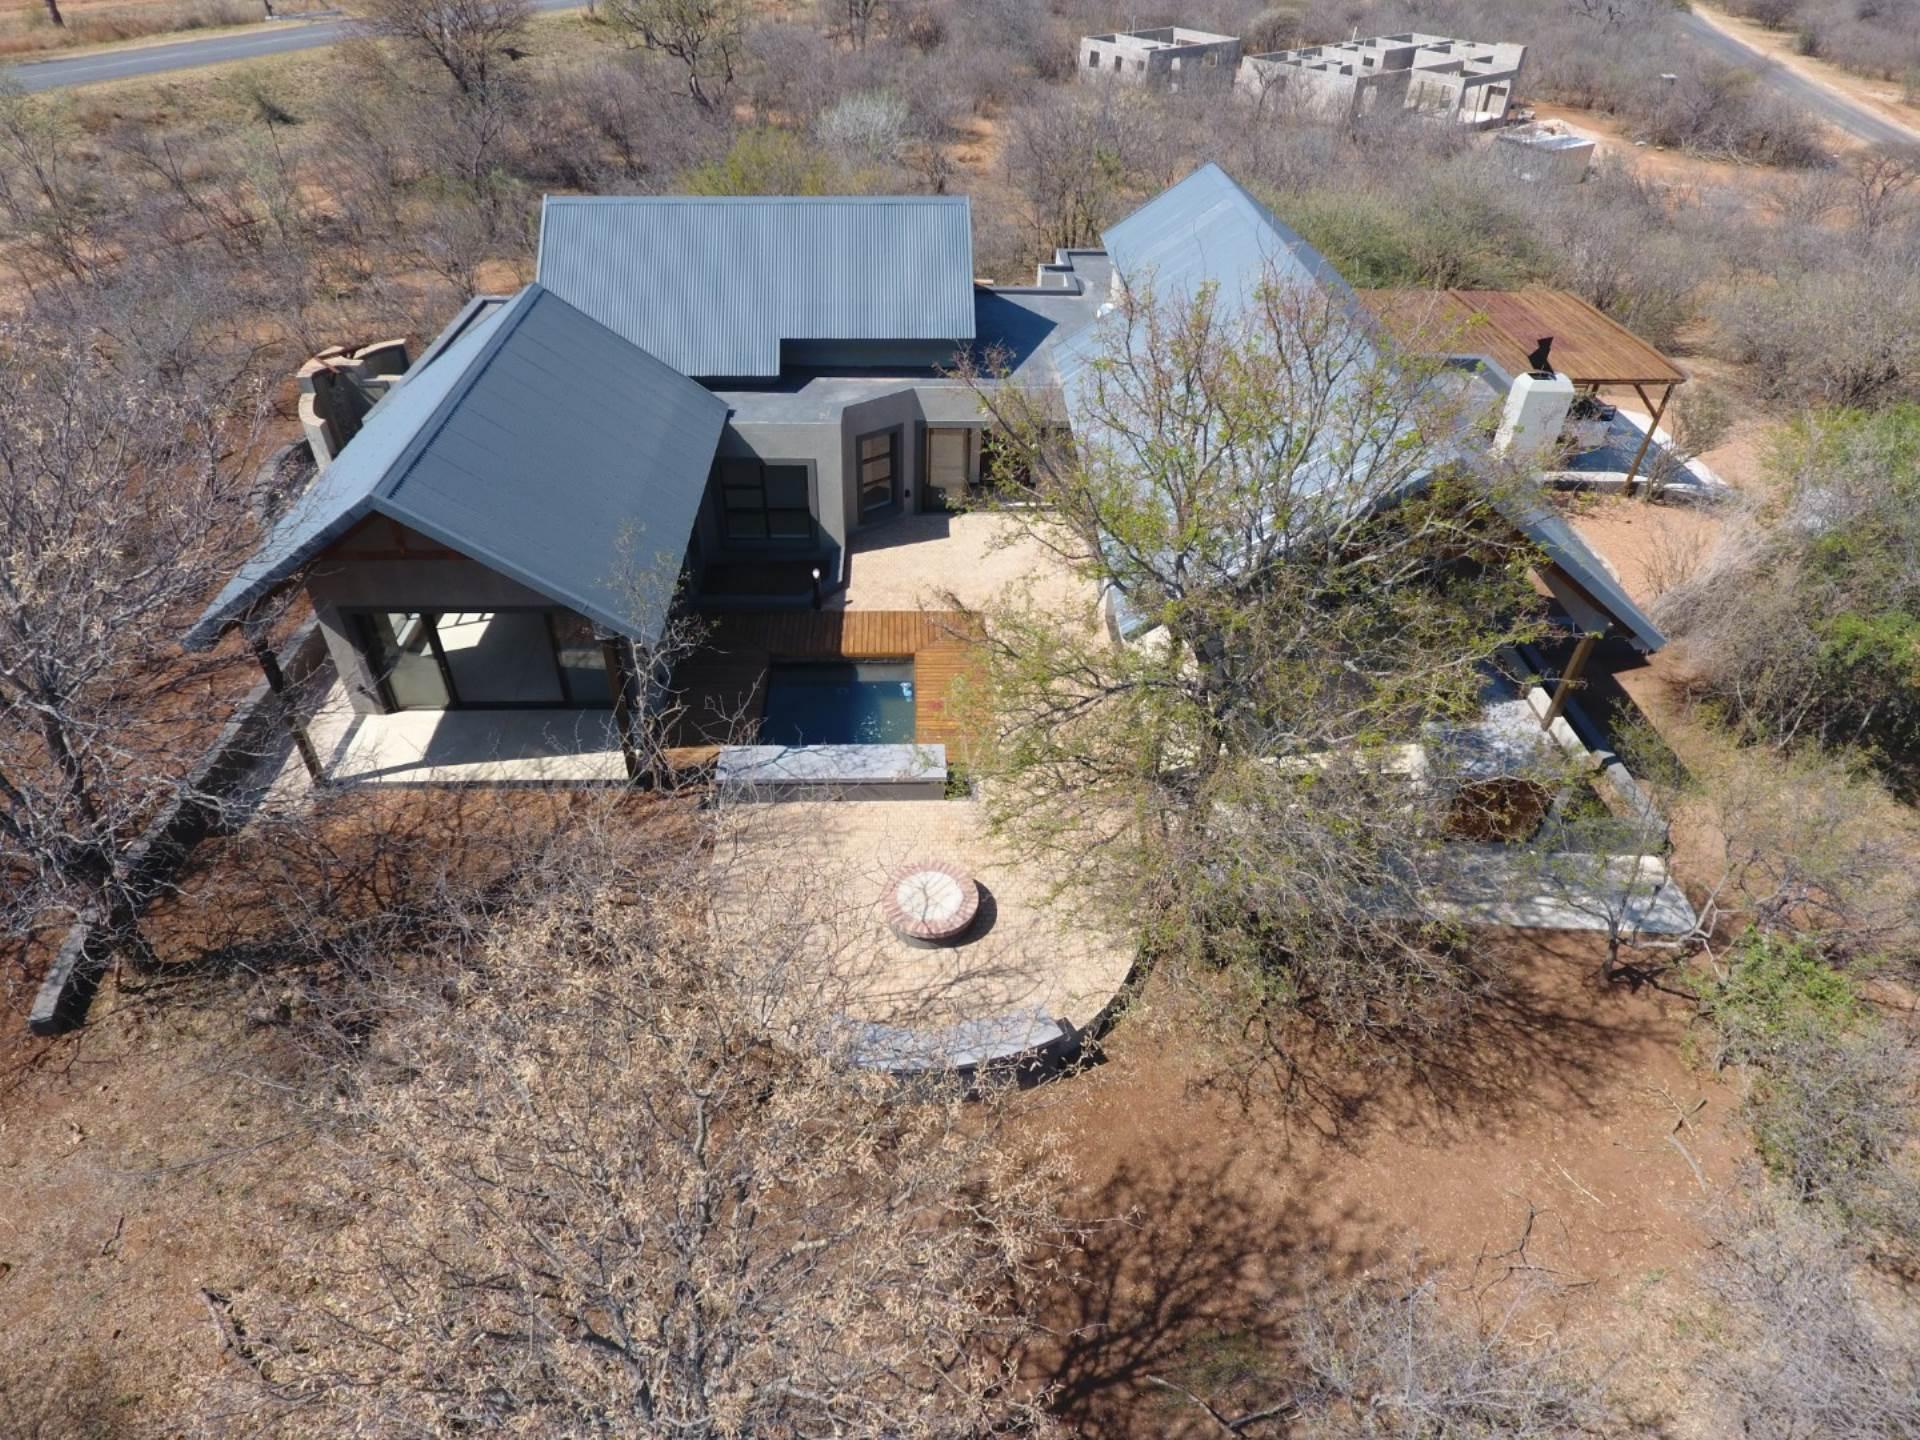 3 BedroomHouse For Sale In Hoedspruit Wildlife Estate